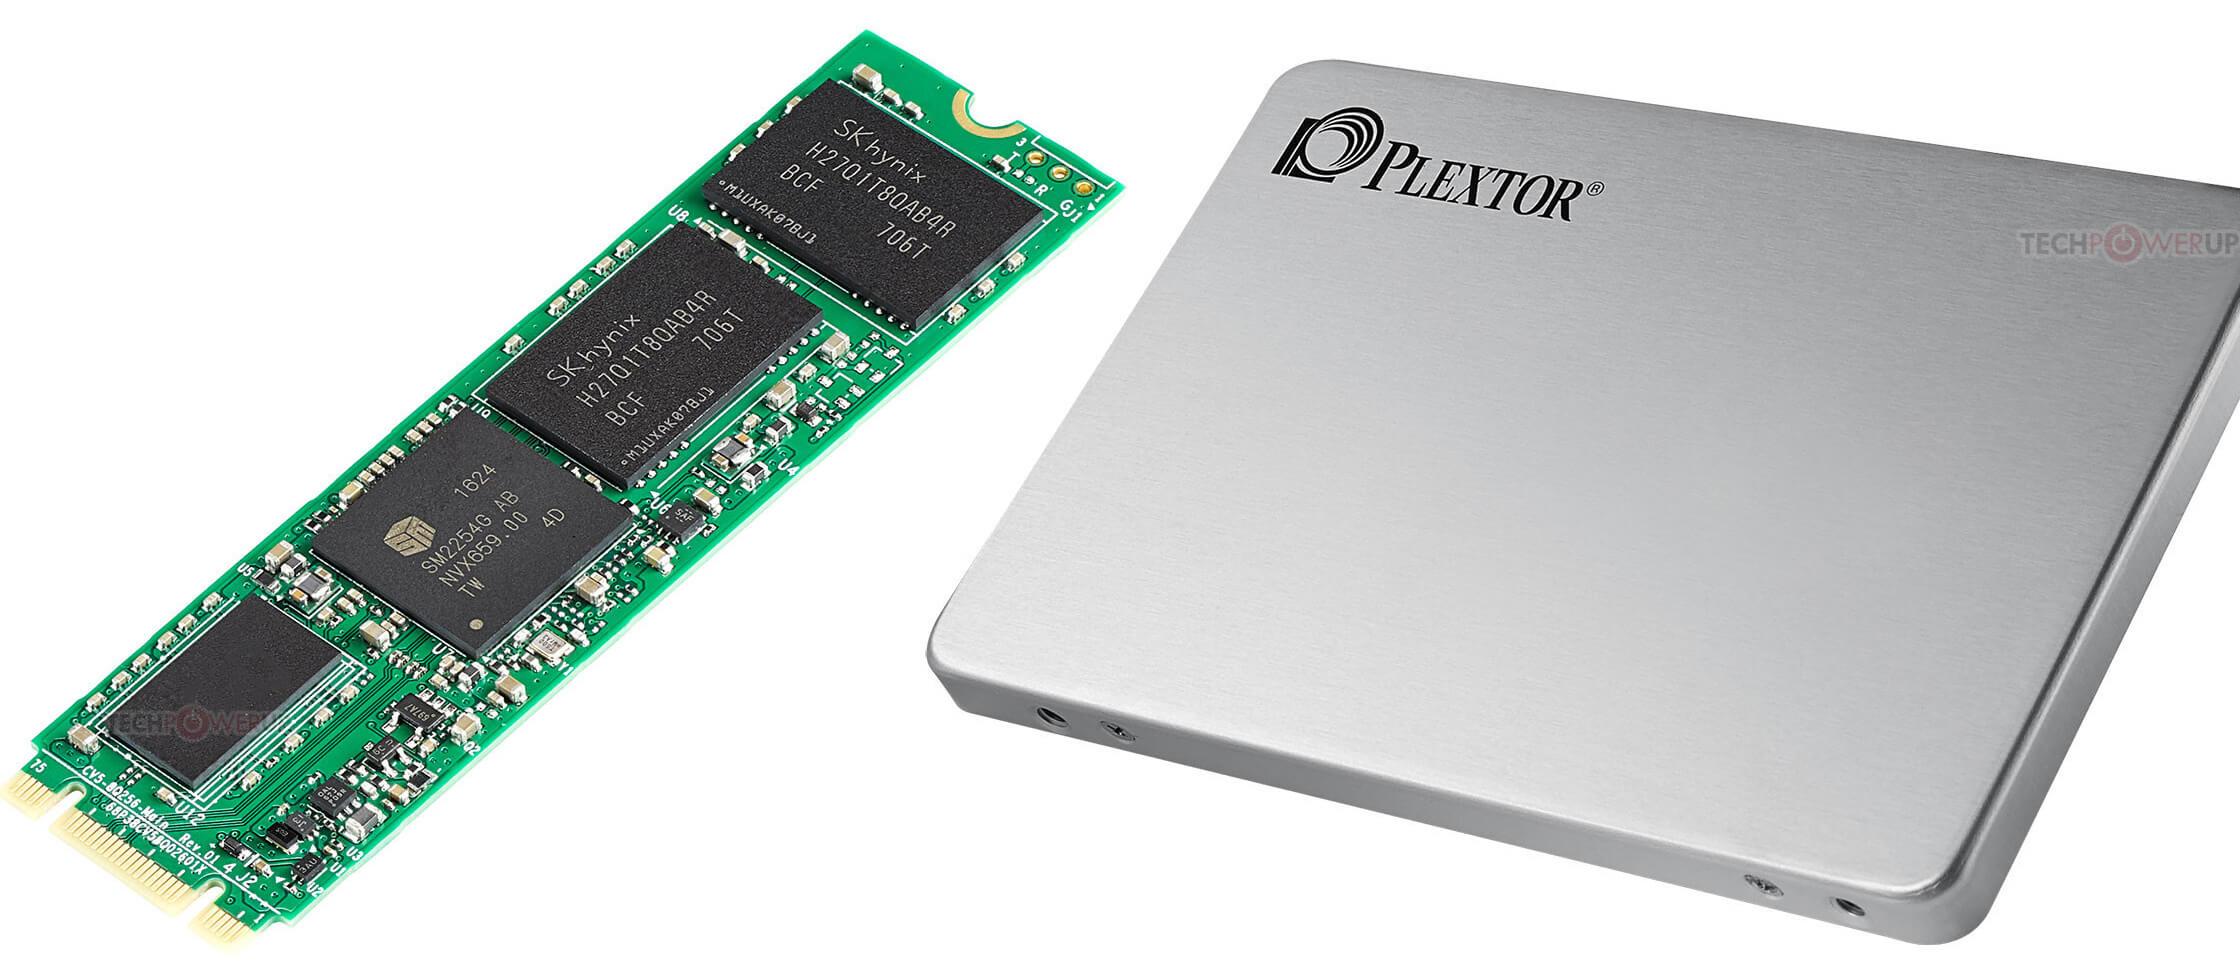 Plextor presenta la serie S3 de SSDs SATA